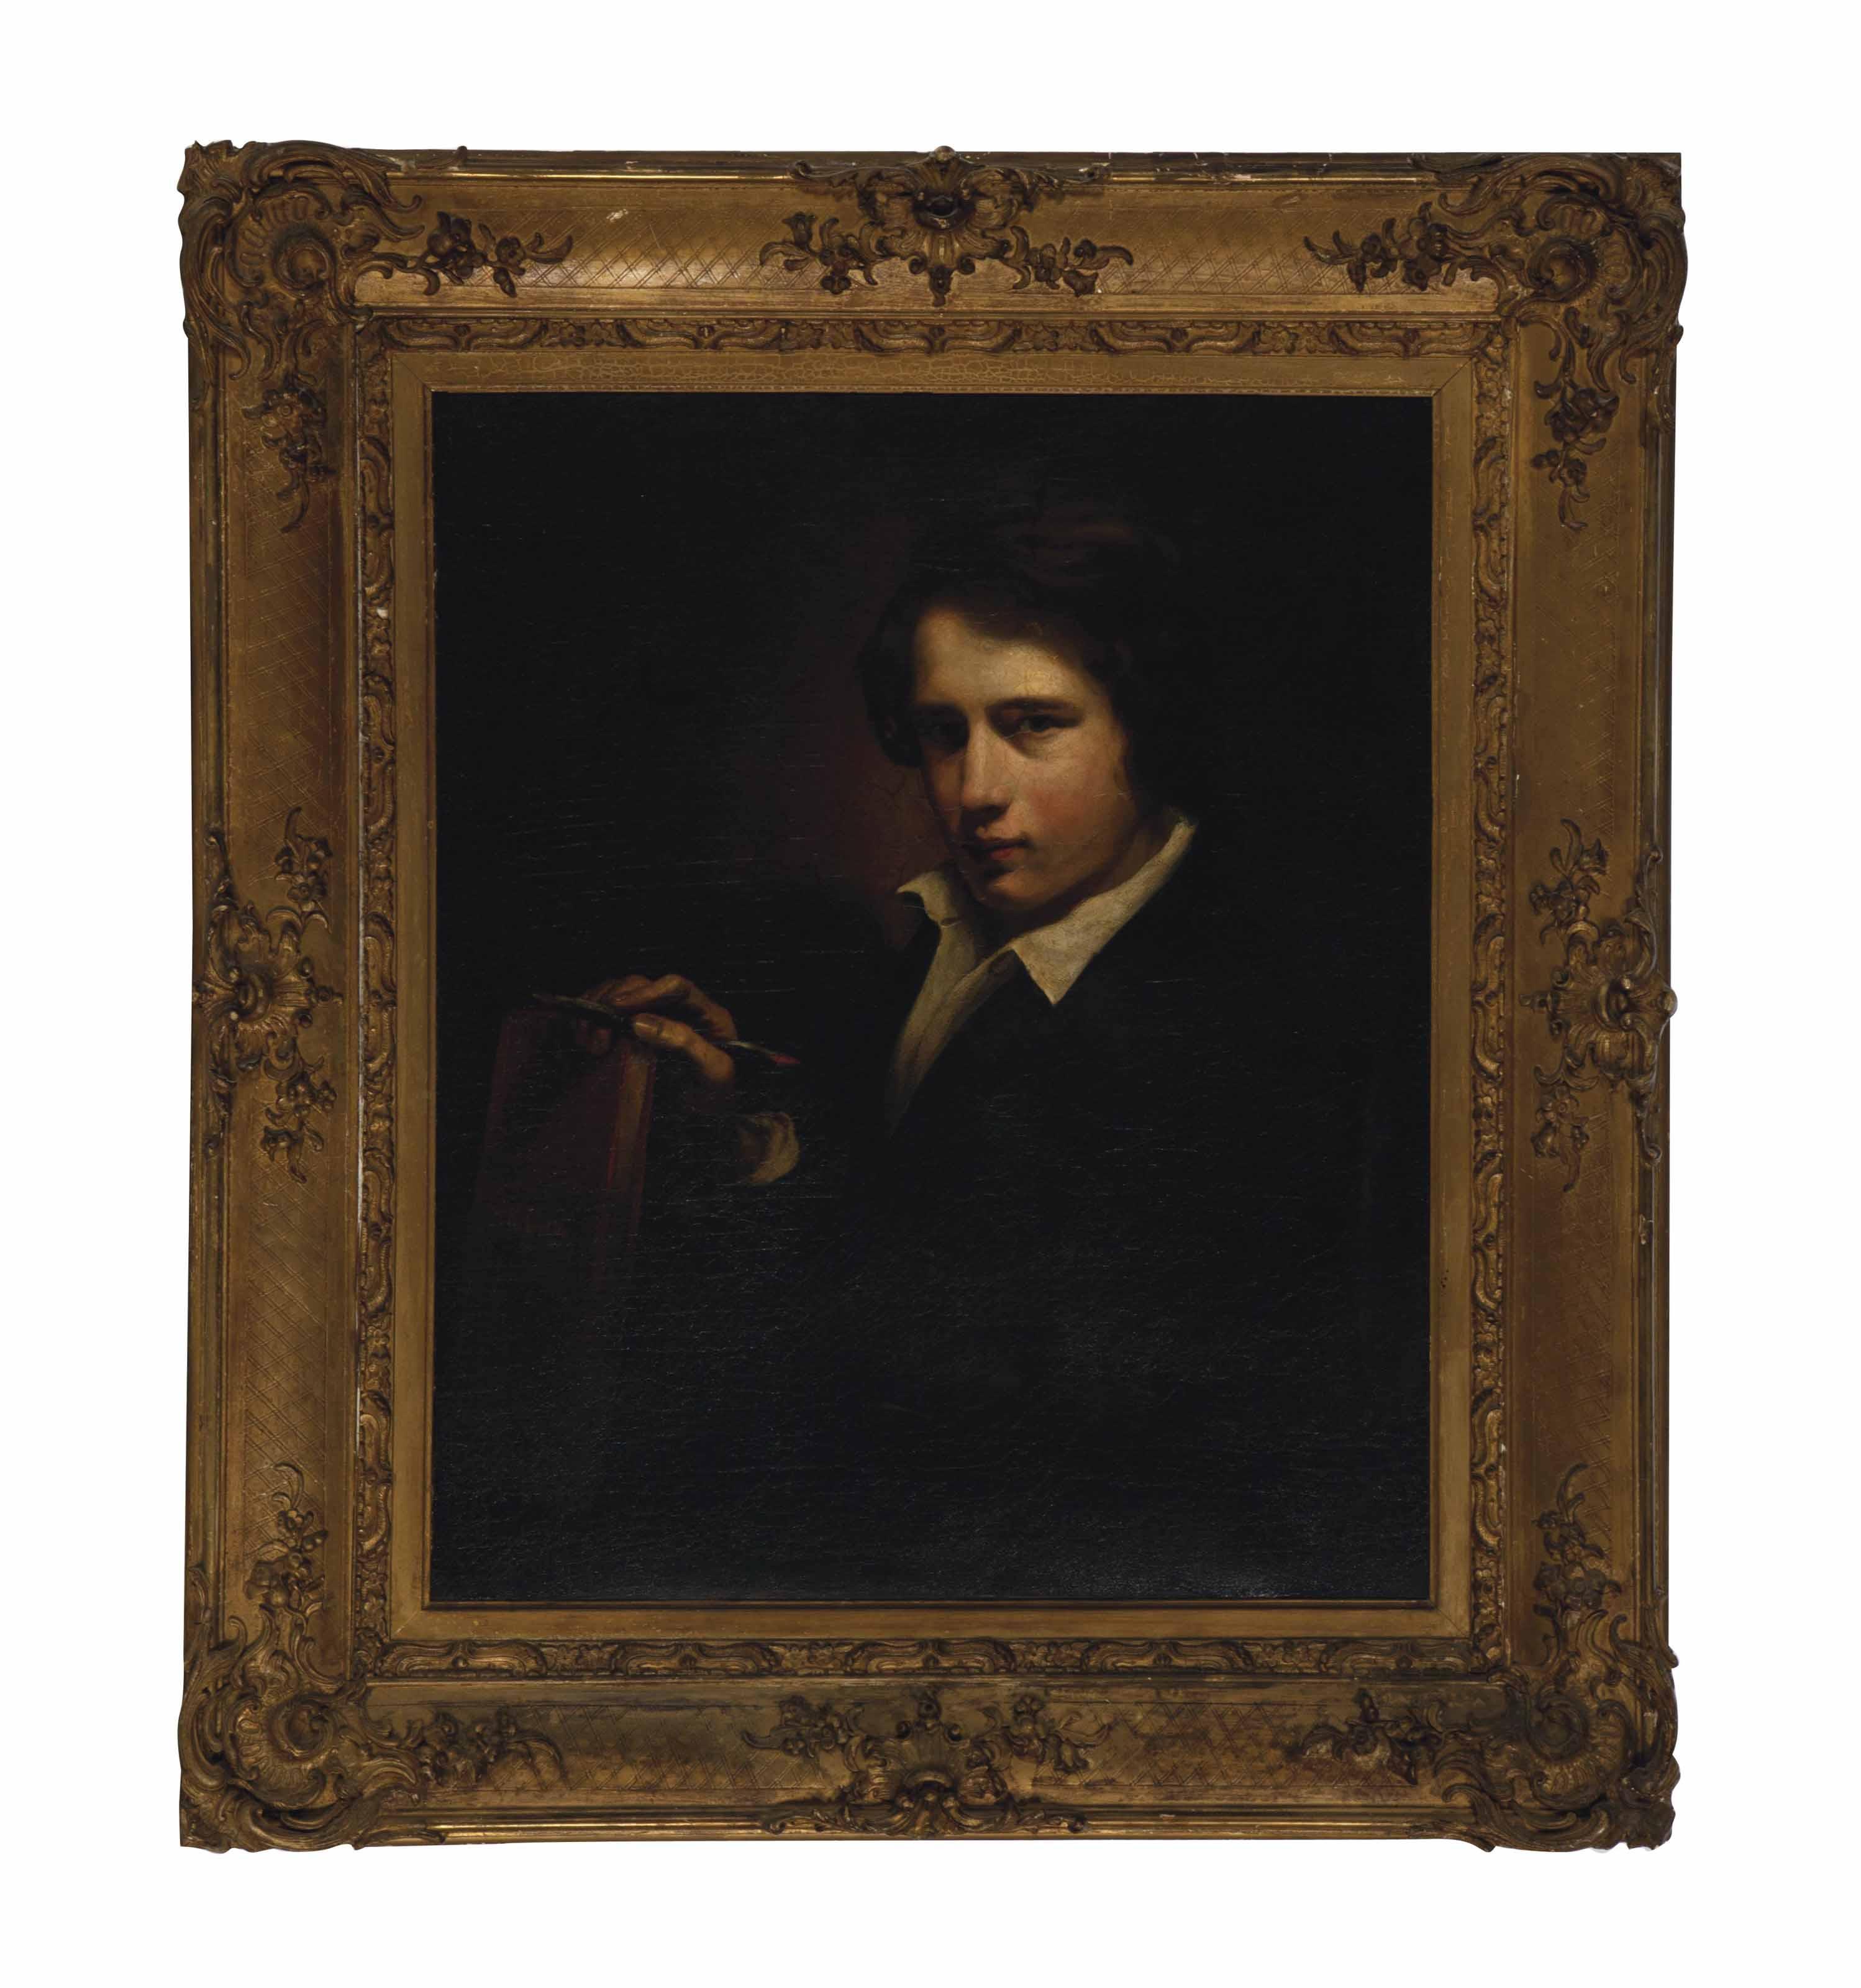 Robert Gavin (SCOTTISH, 1827-1